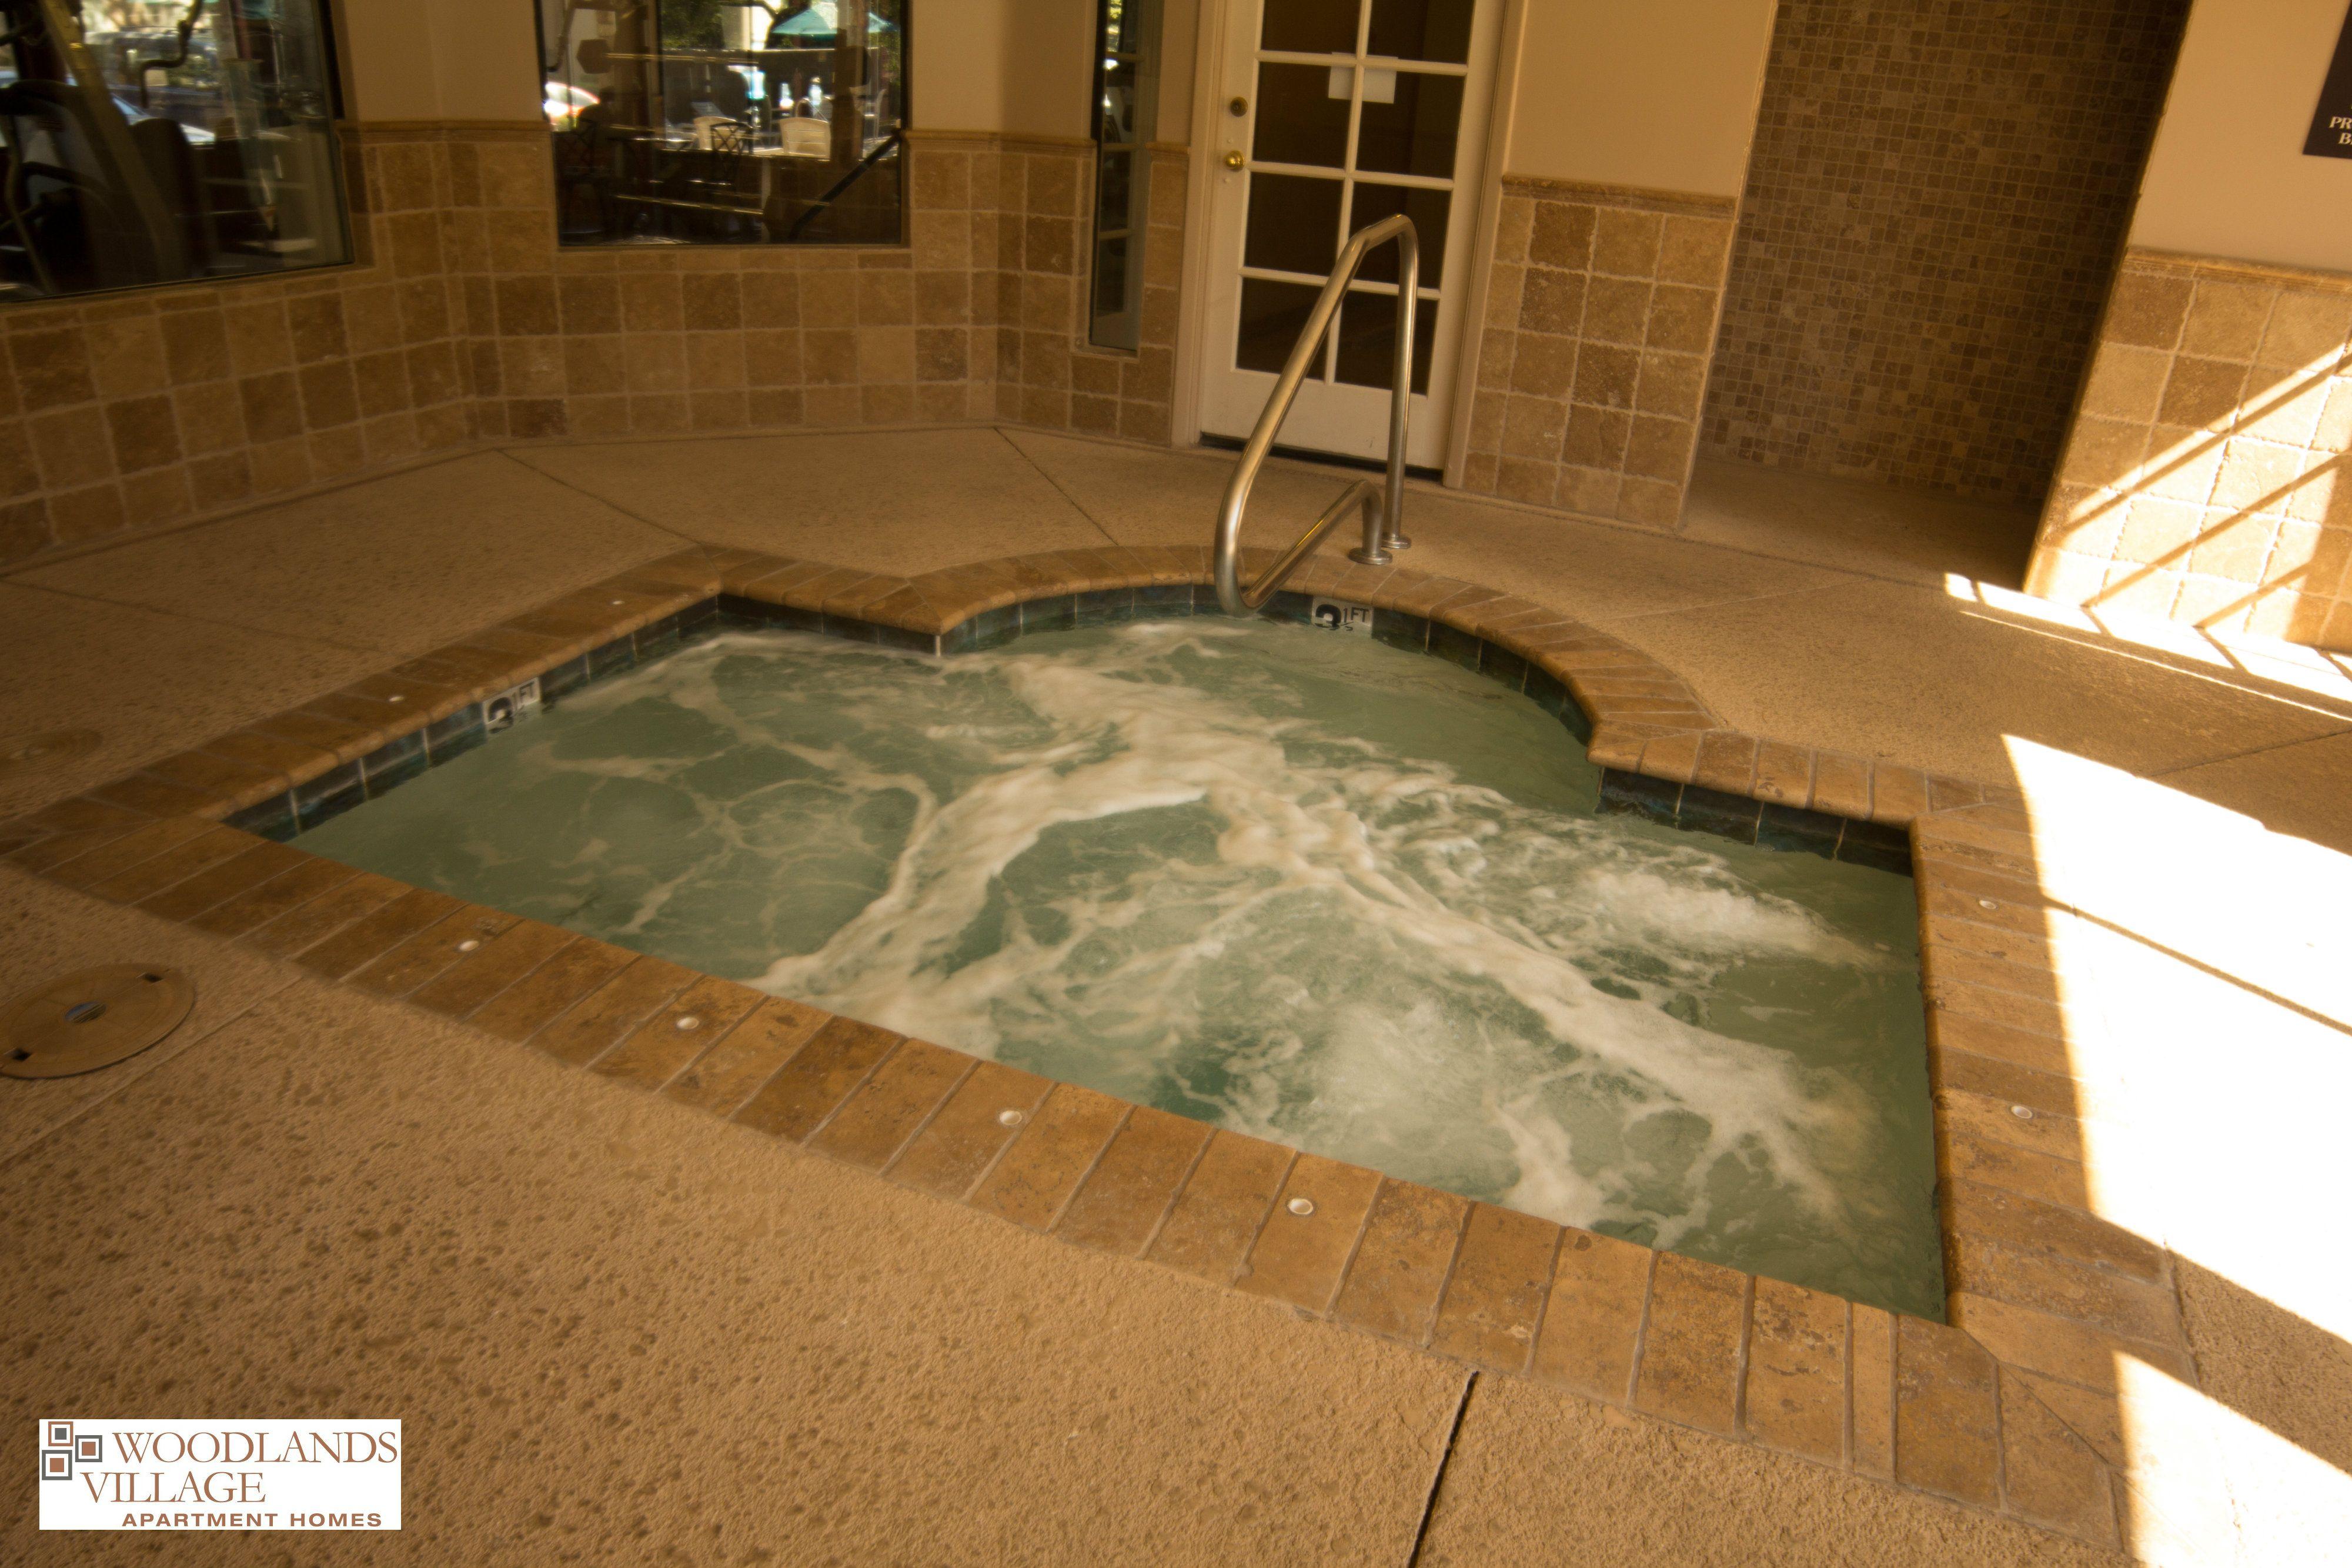 Woodlands Village Indoor Hot Tub Flagstaff Az Indoor Hot Tub Apartments For Rent Woodlands